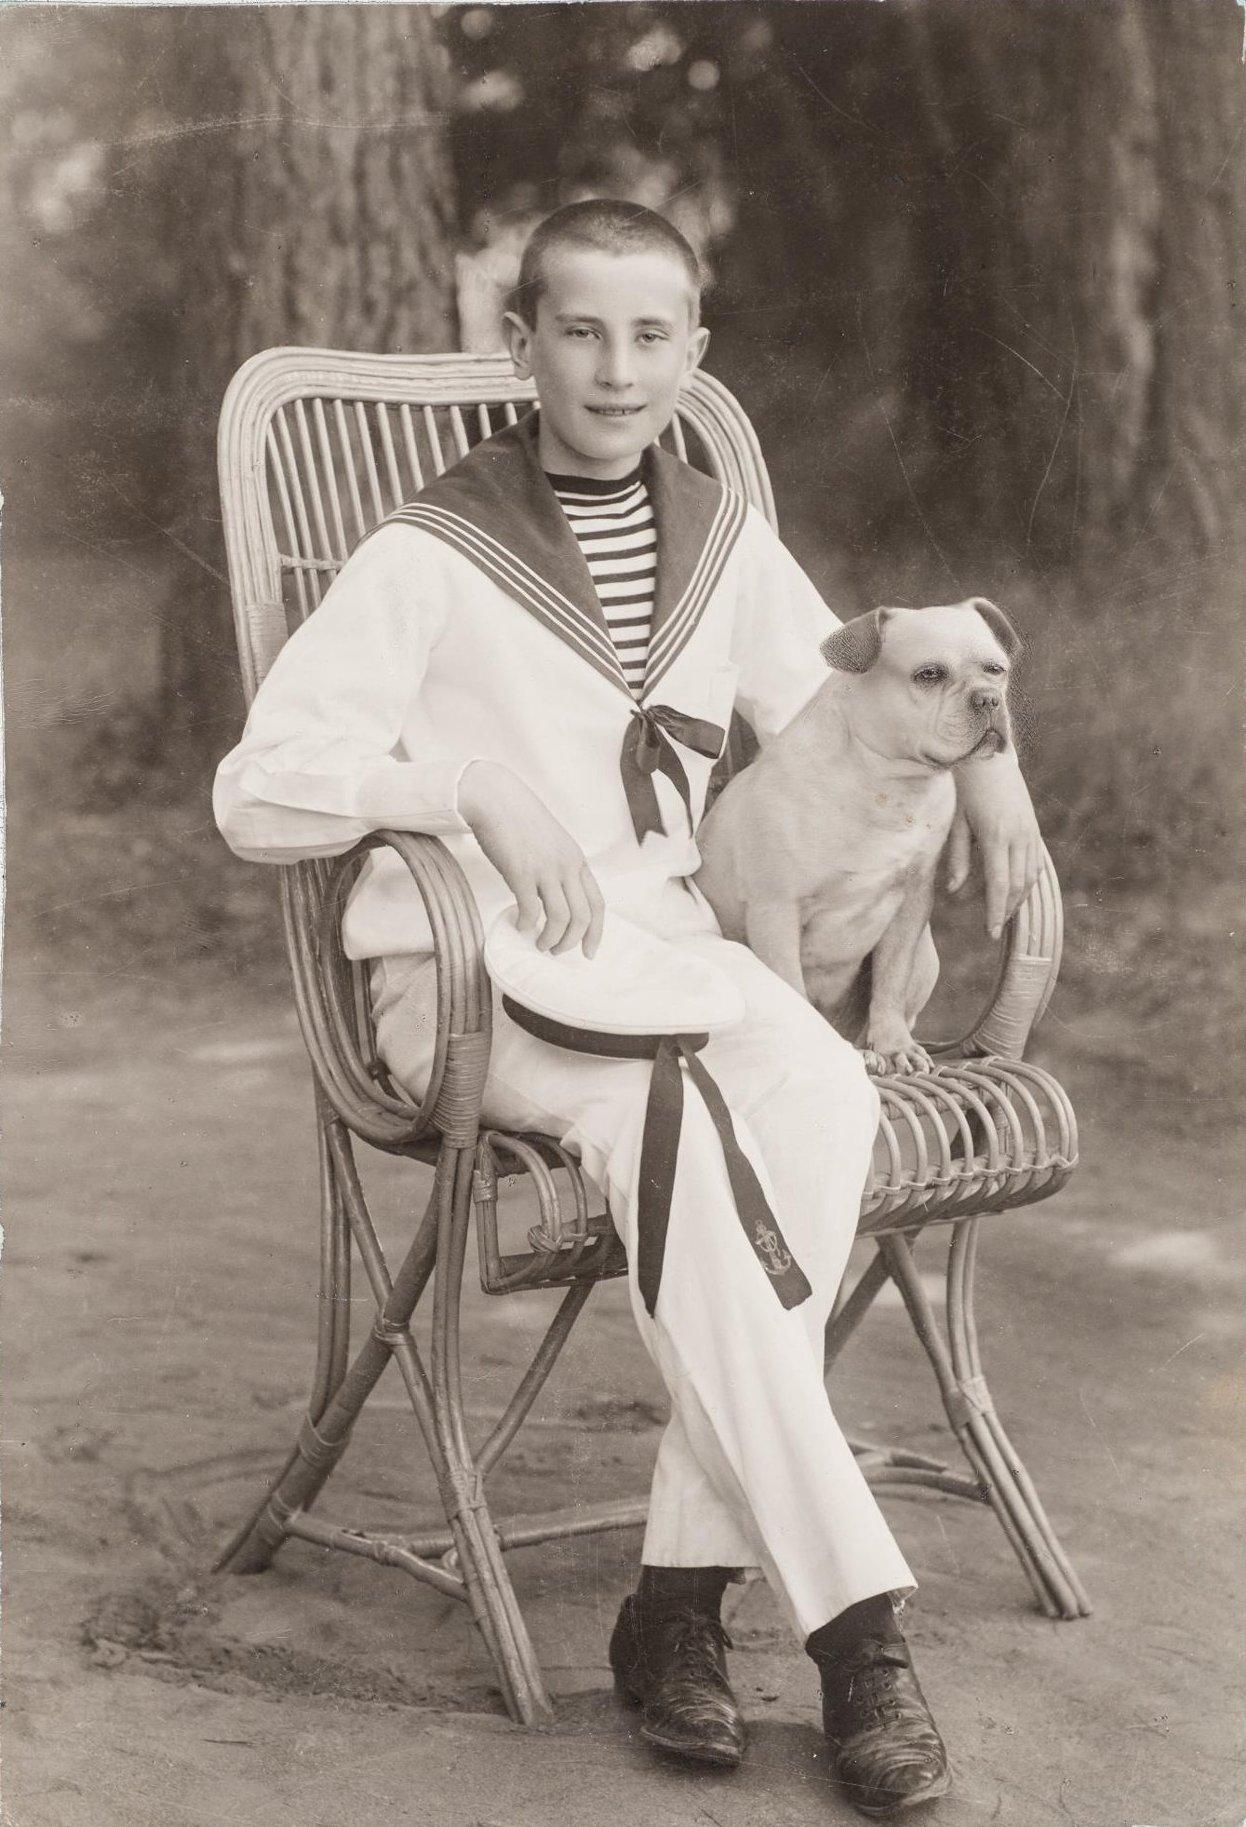 1900. Портрет Юсупова Феликса Феликсовича-младшего